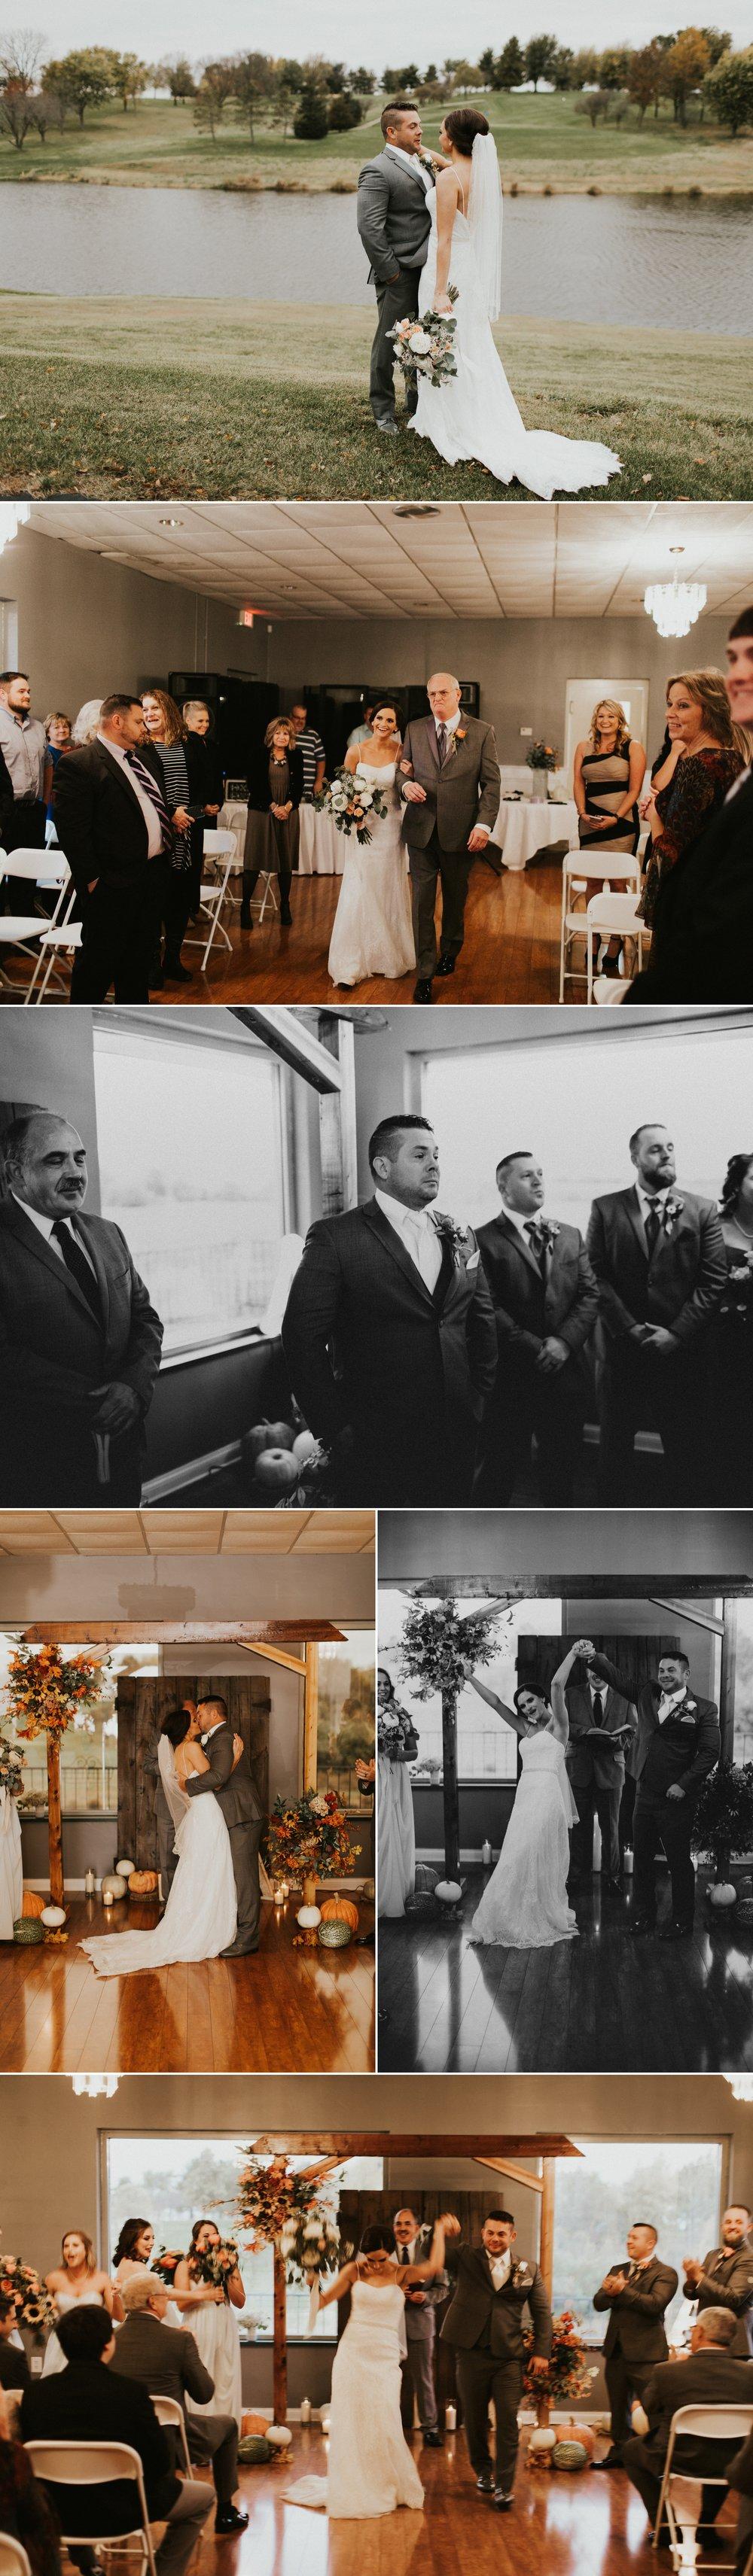 The Ault Wedding 9.jpg